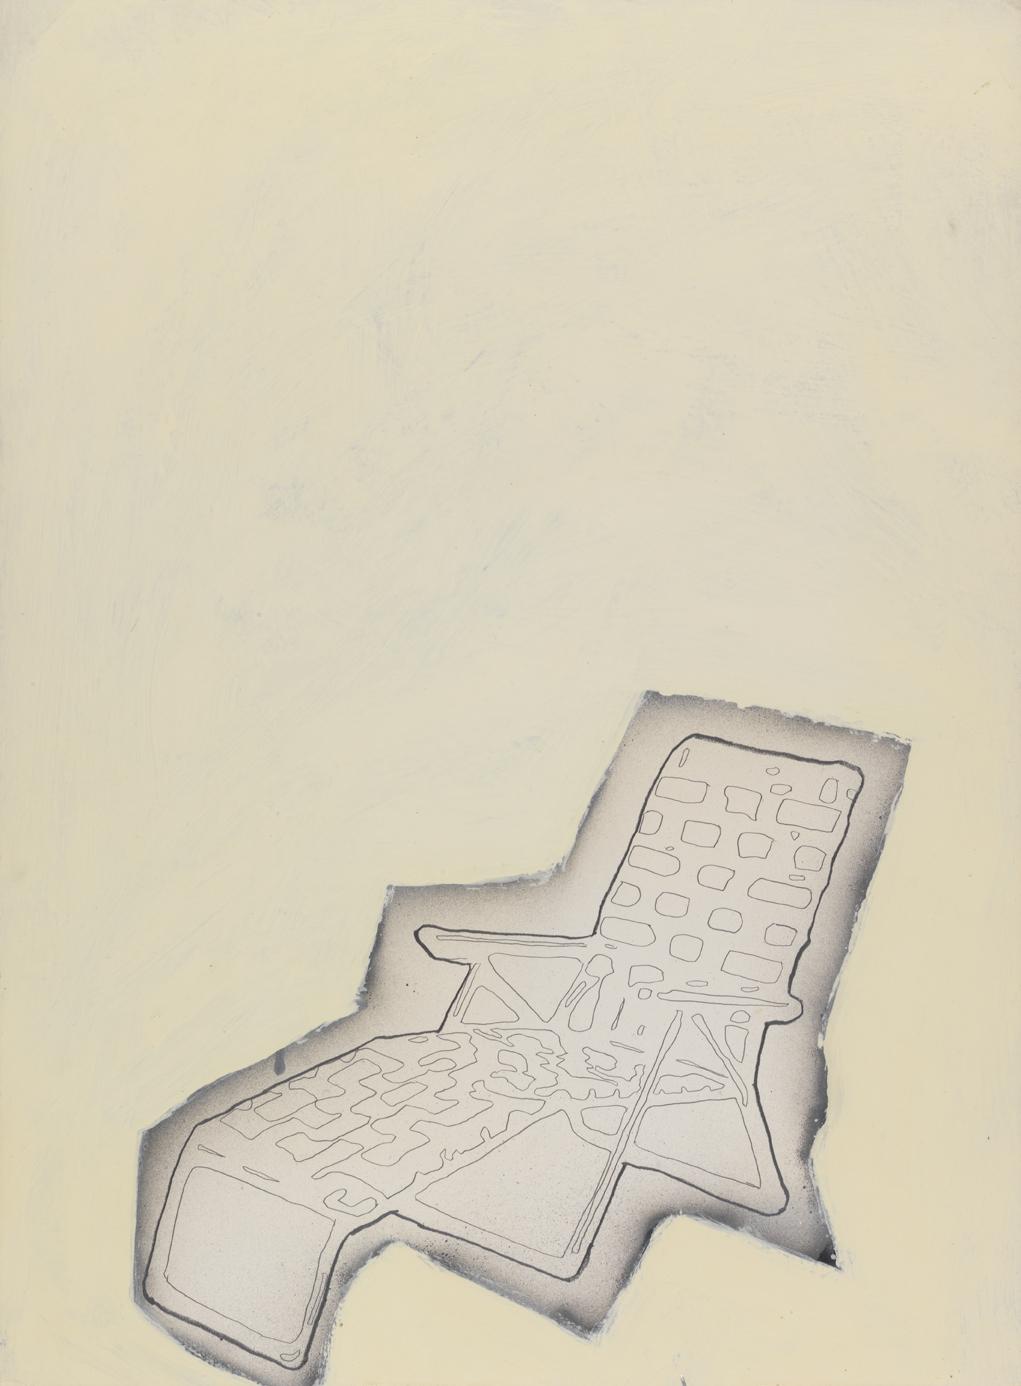 Resort Group   1980  graphite, spray enamel and oil-based enamel on paper  30 x 22 in / 76.2 x 55.9 cm